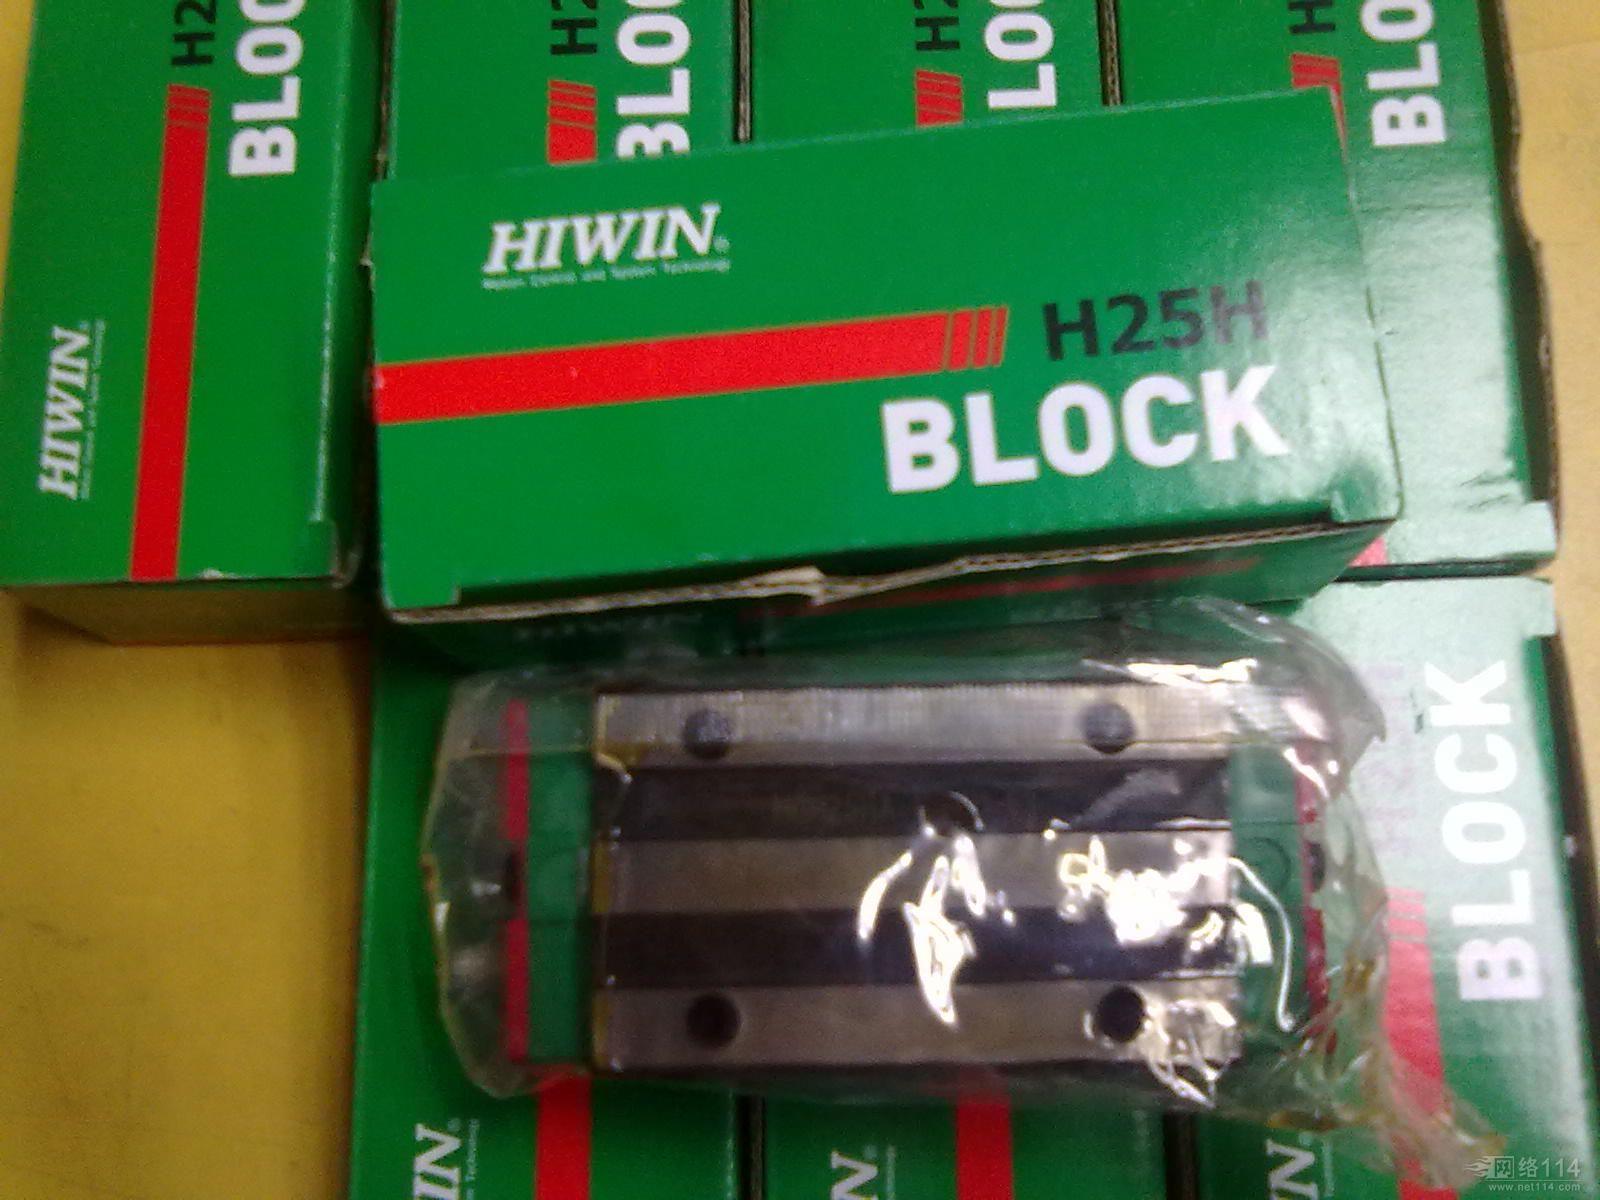 free shipping genuine HIWIN linear guide HGH25HAH block for Taiwan free shipping sop32 wide body test seat ots 32 1 27 16 soic32 burn block programming block adapter